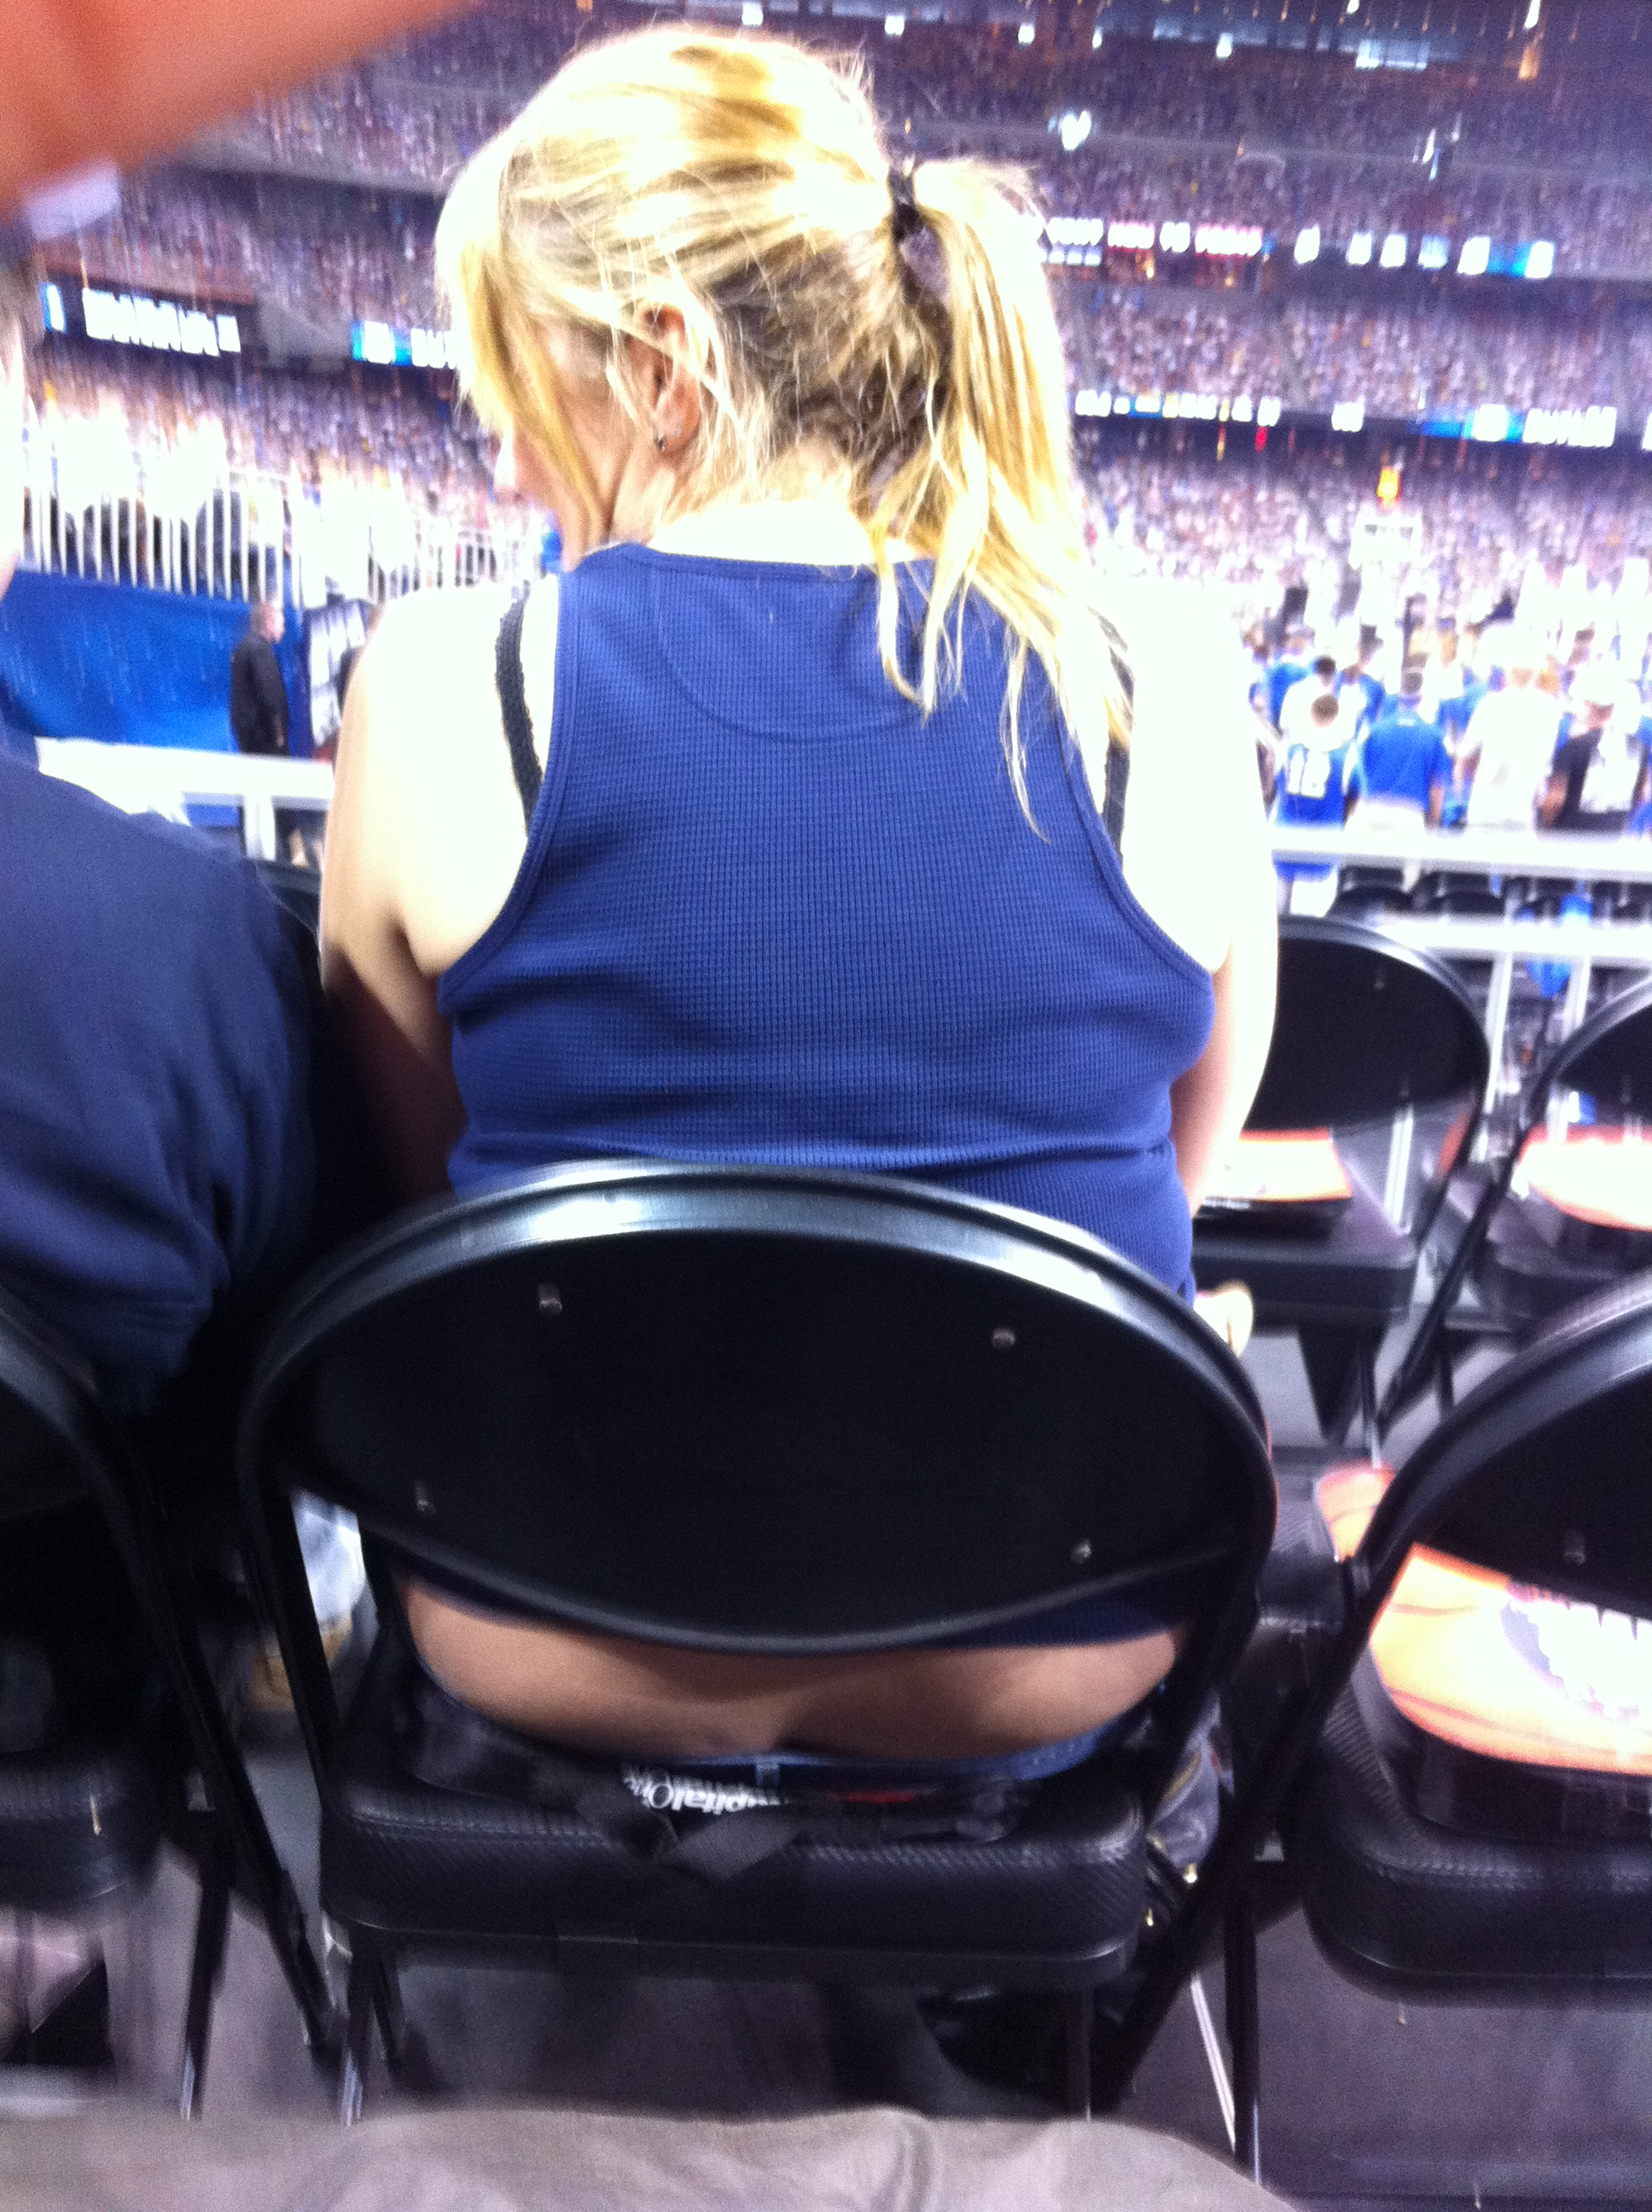 Panties Pics Crack